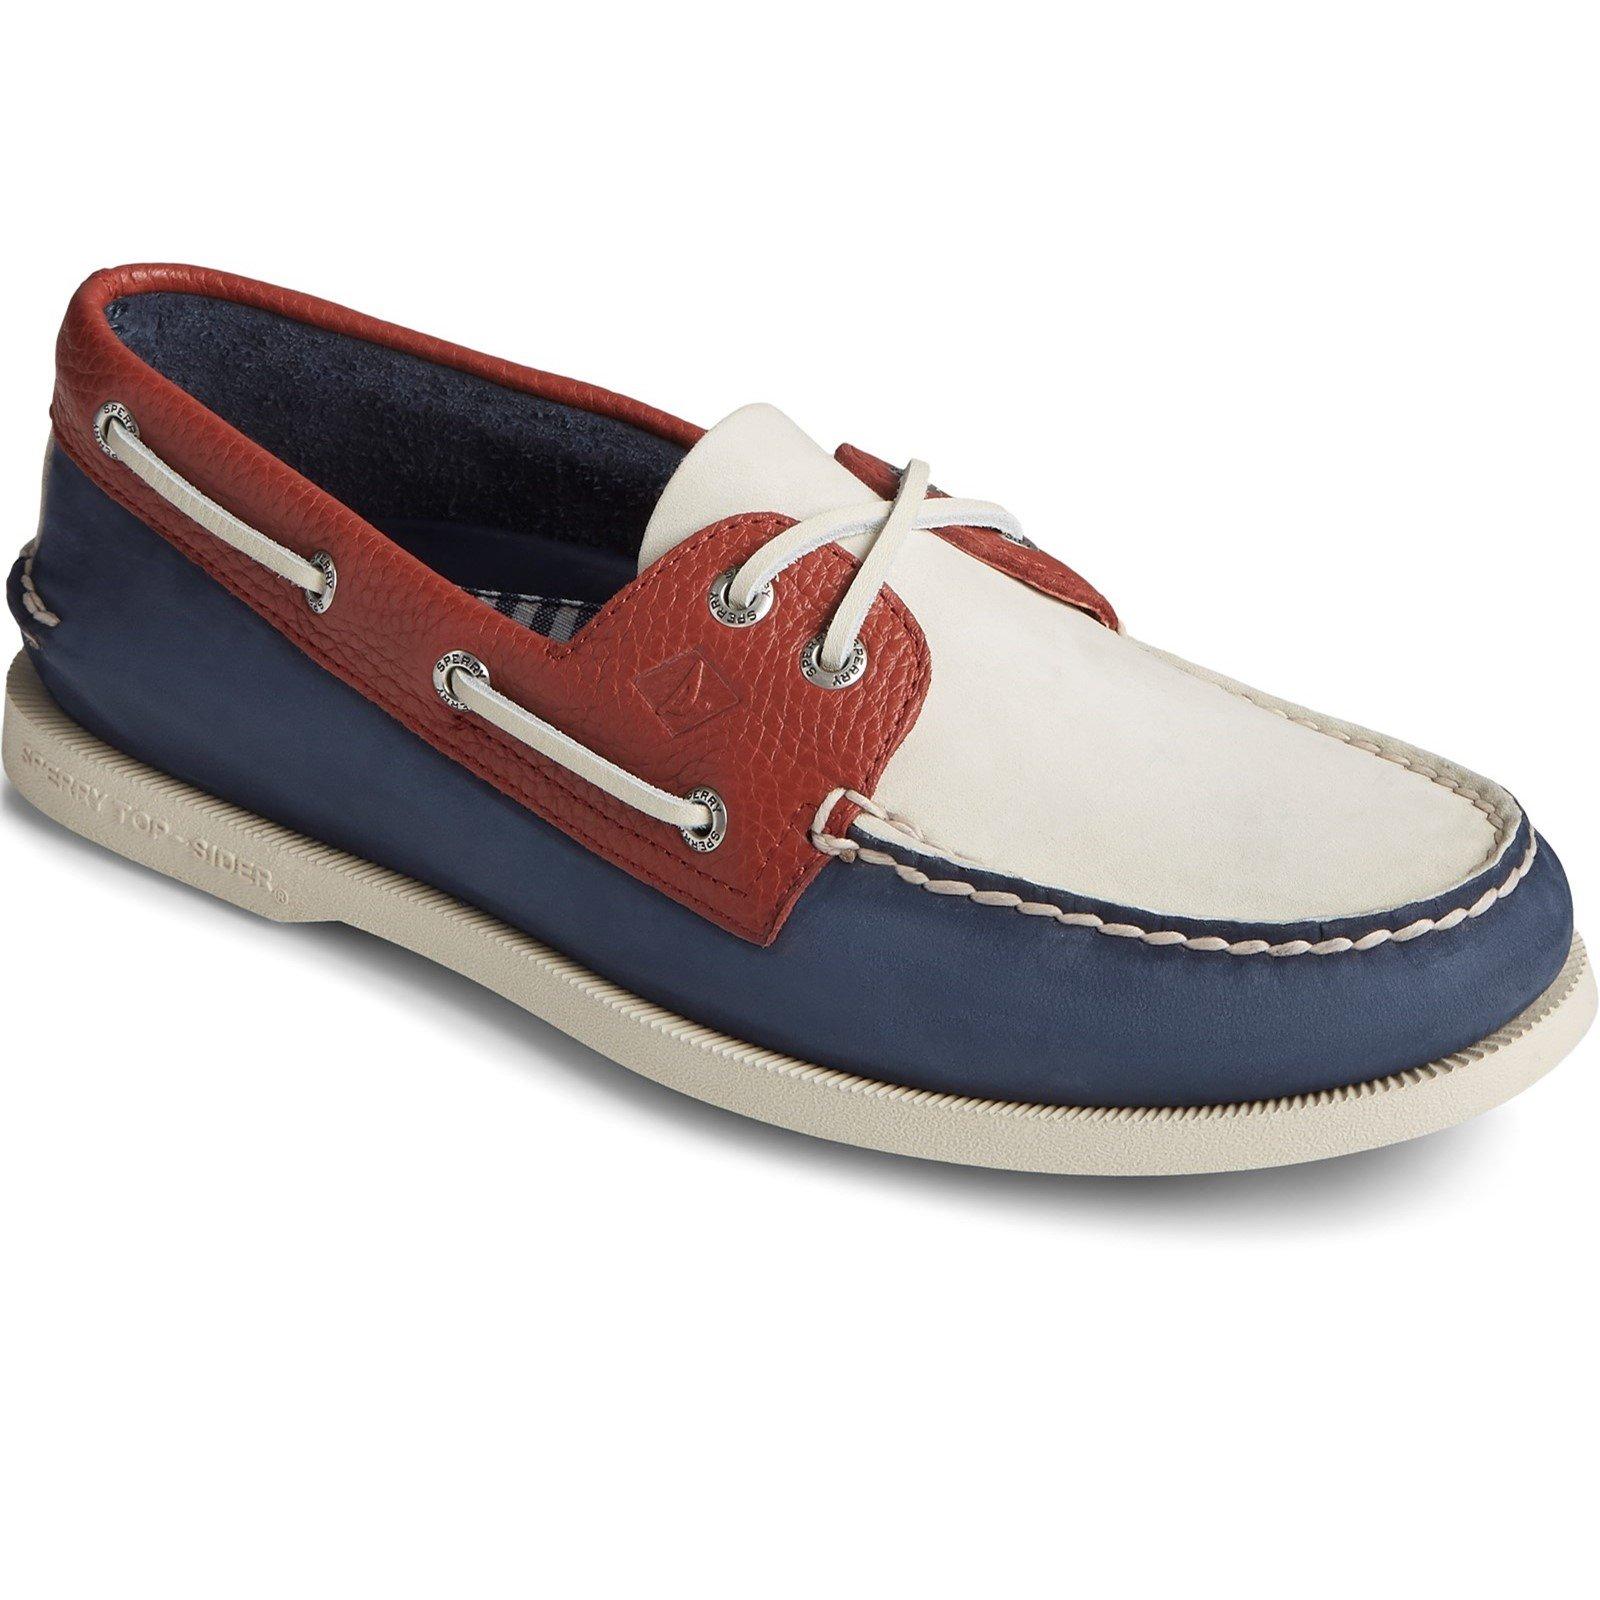 Sperry Men's A/O 2-Eye Nubuck Boat Shoe Various Colours 32920 - Blue/White 11